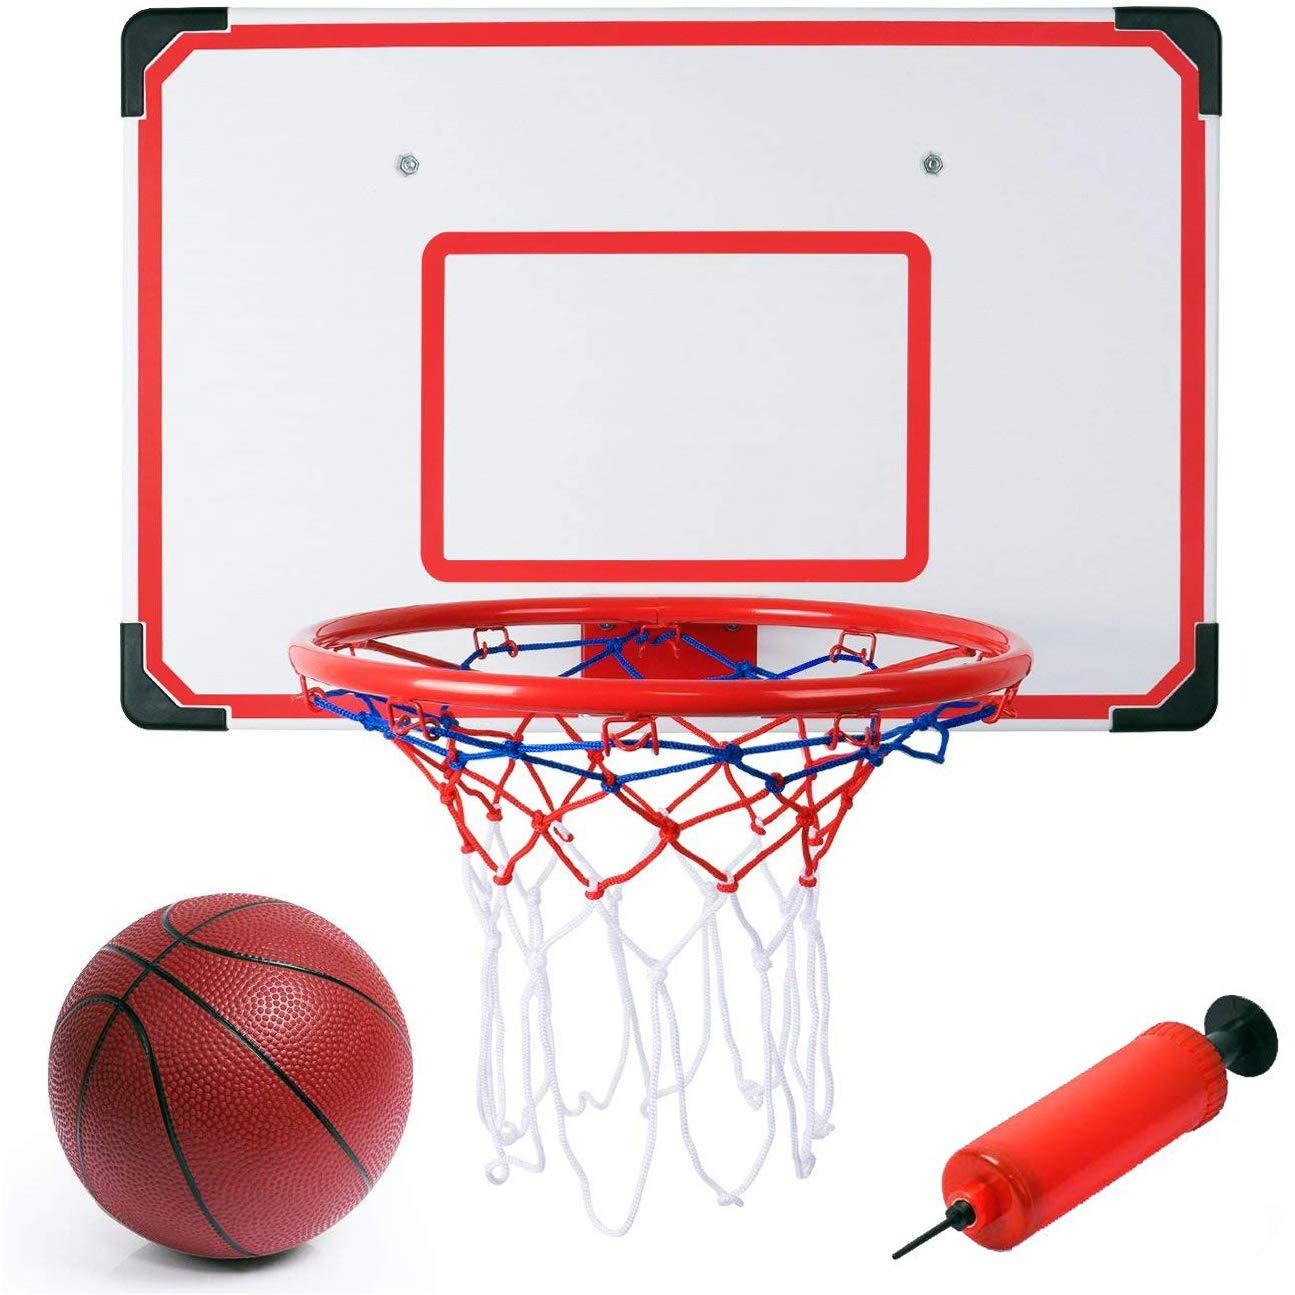 "Buy Liberty Imports Indoor/Outdoor XL Big Basketball Hoop Set - 27"" X 18""  Backboard + 15"" Rim Online at Low Prices in India - Amazon.in"